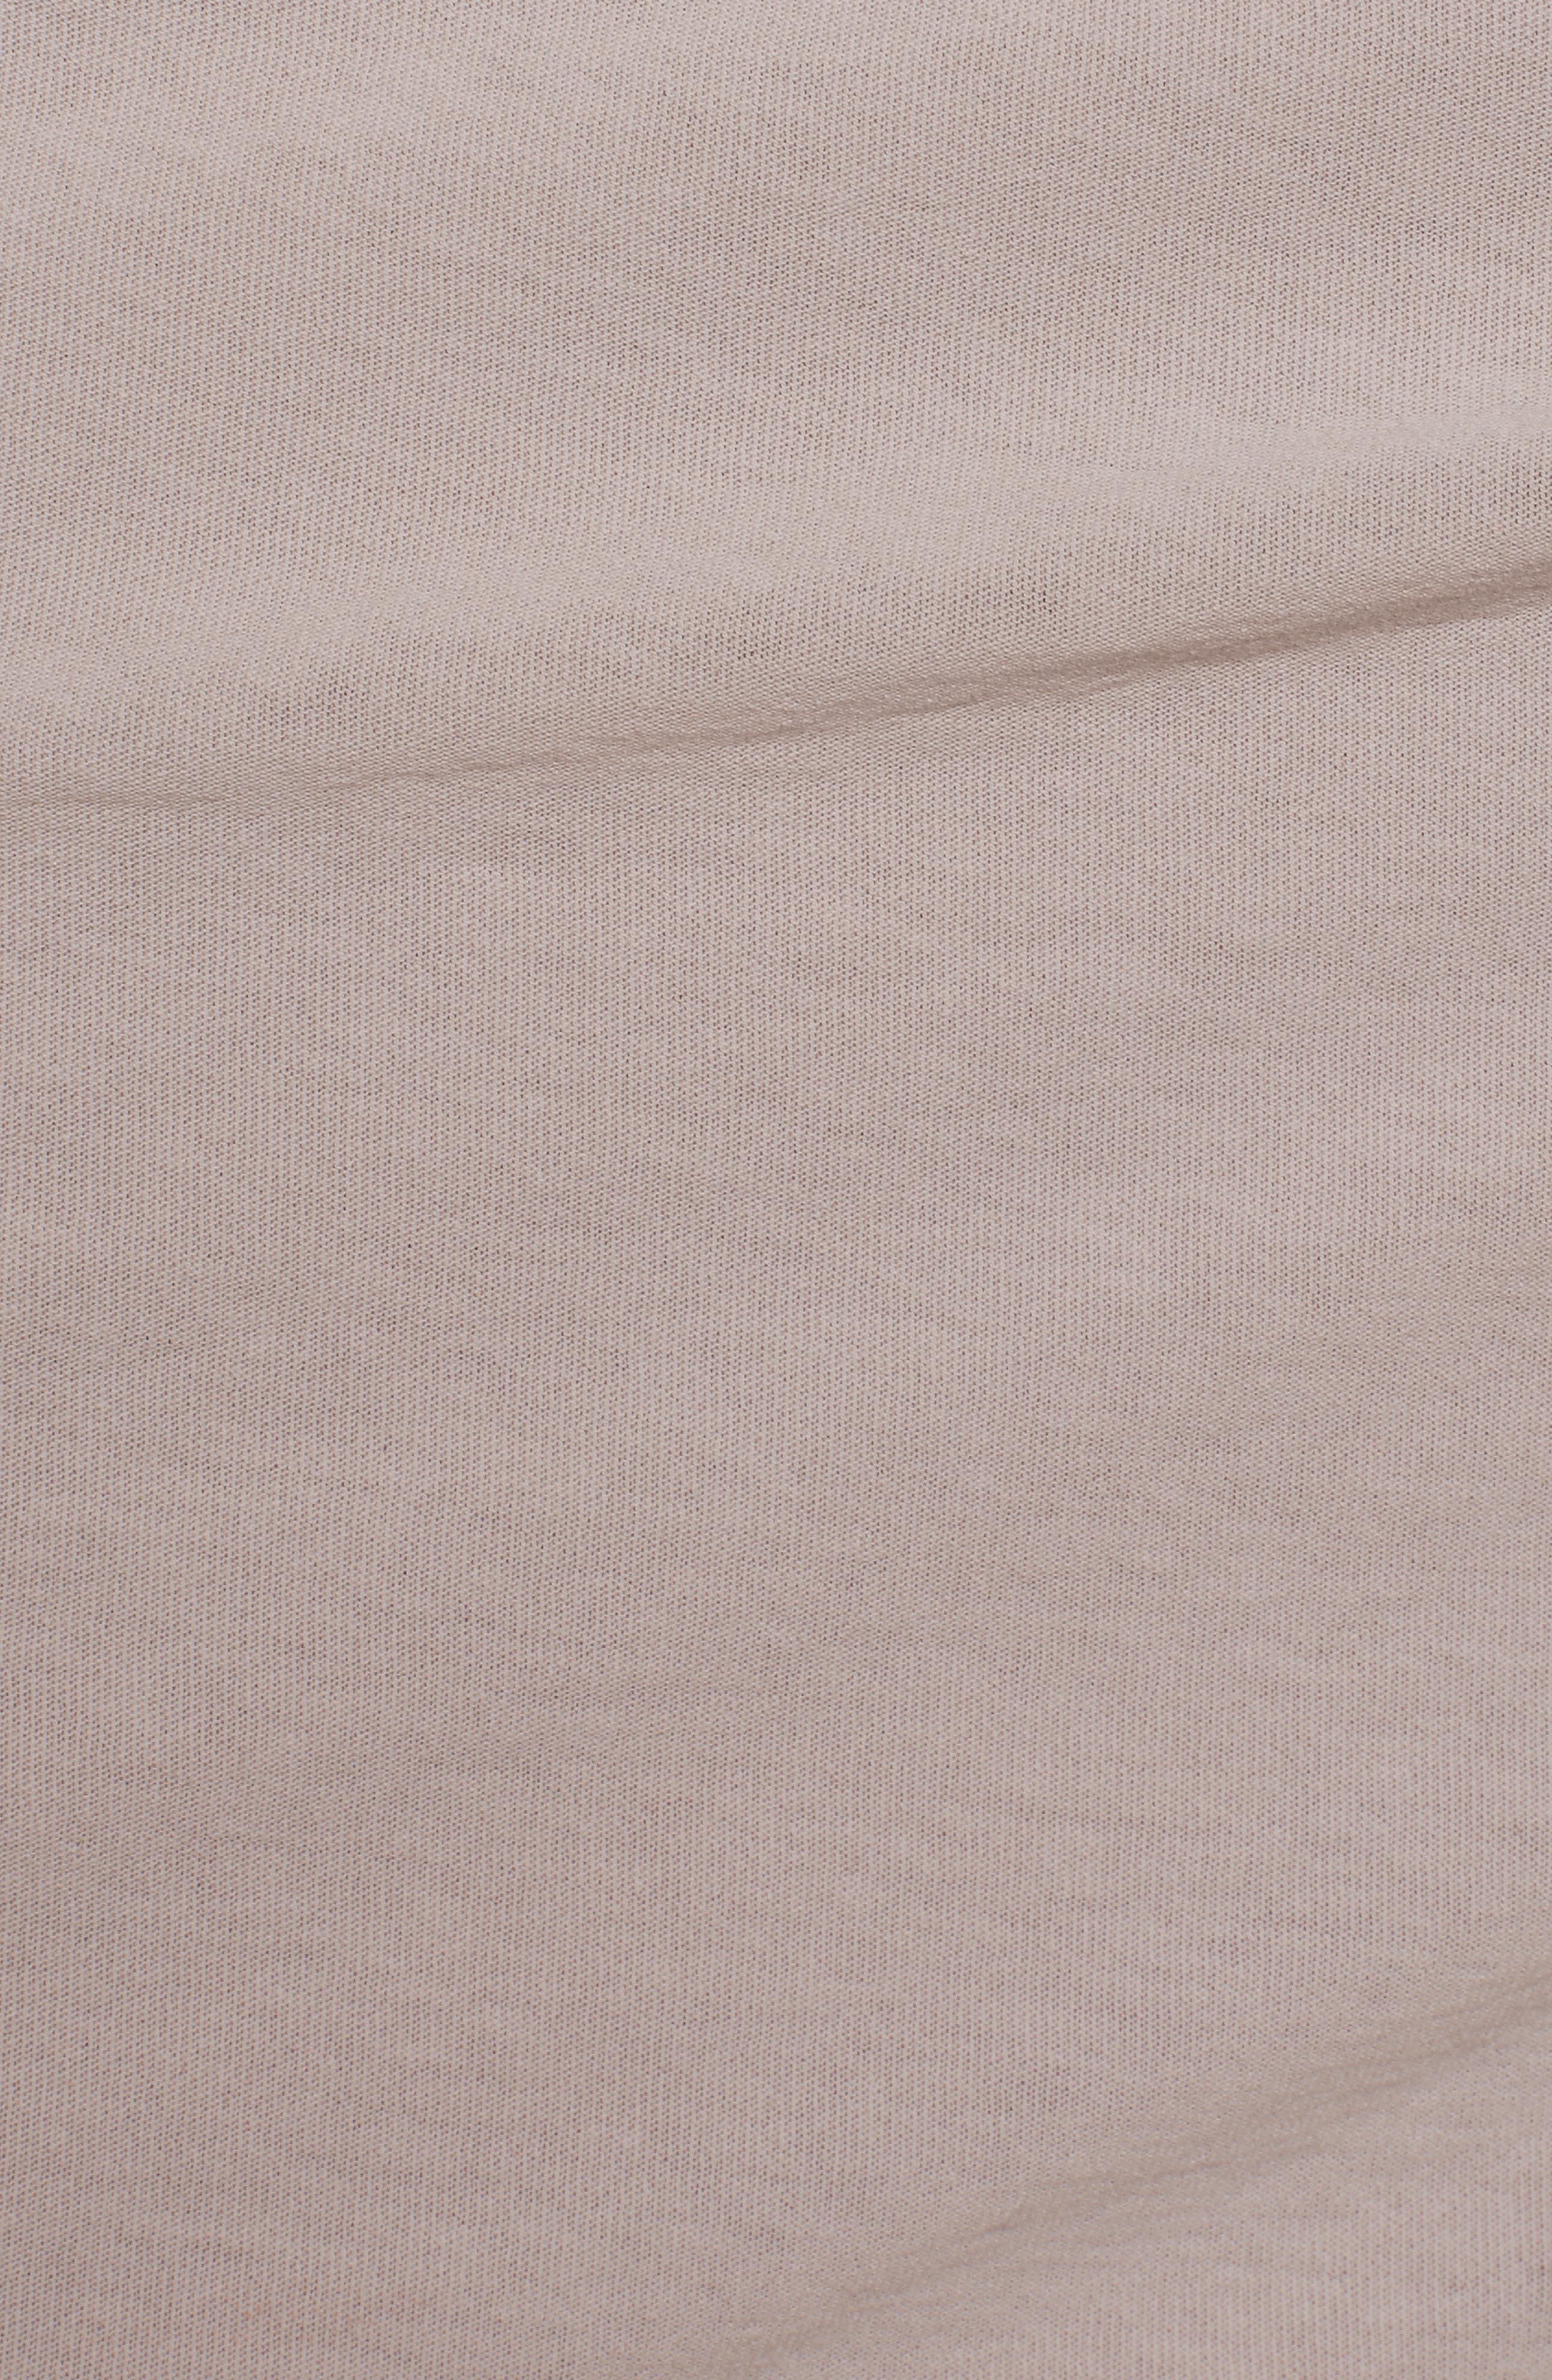 Shirred Cotton Dress,                             Alternate thumbnail 6, color,                             085